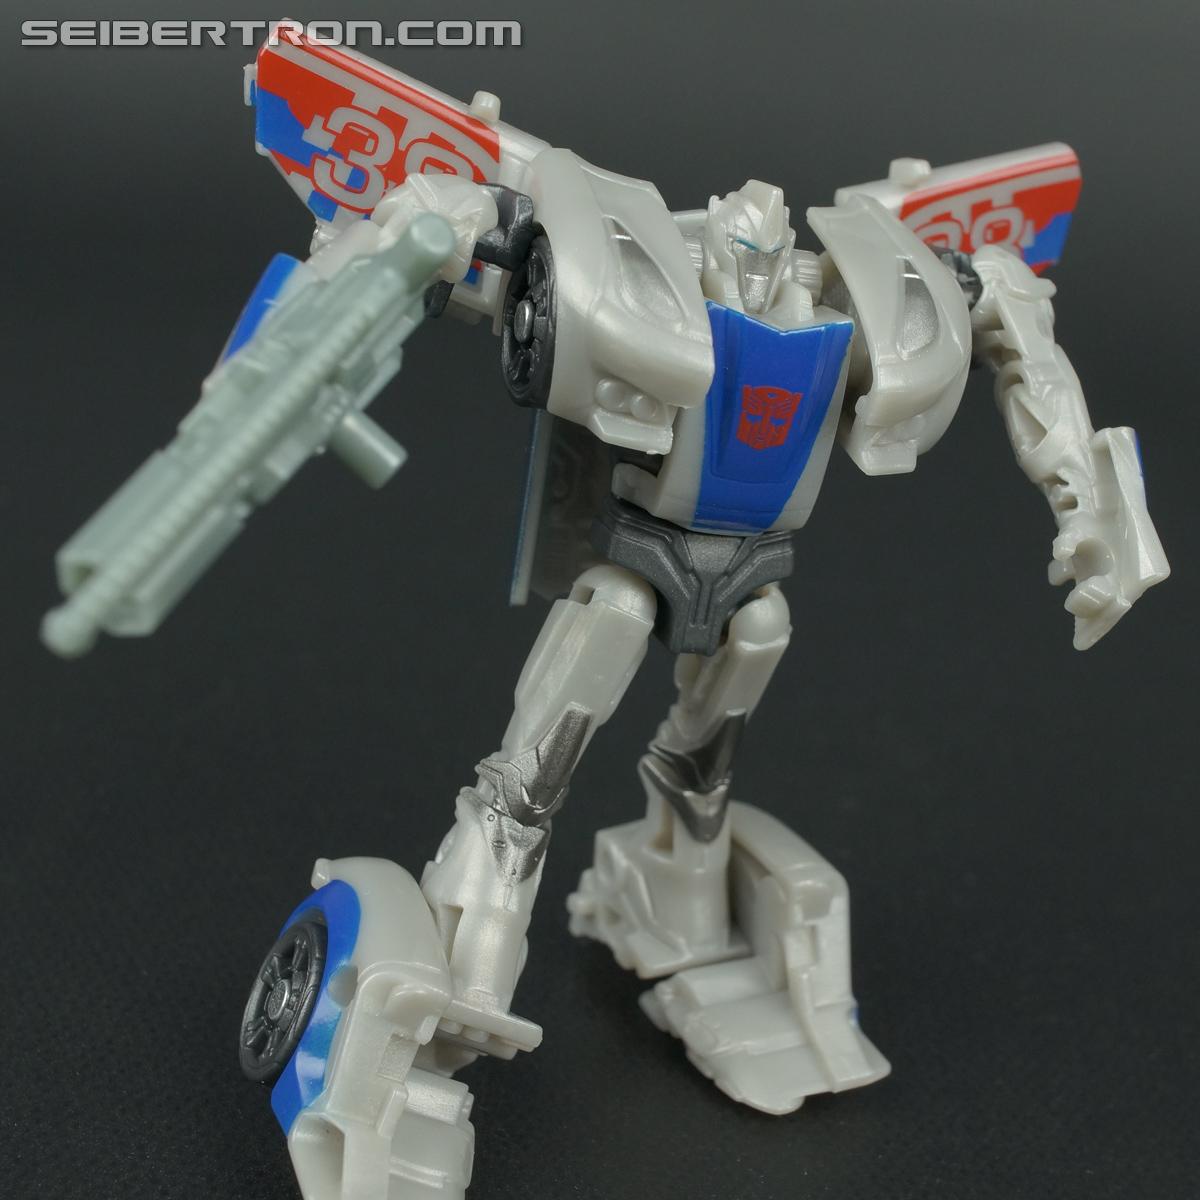 Transformers Prime Beast Hunters Cyberverse Smokescreen (Image #71 of 93)